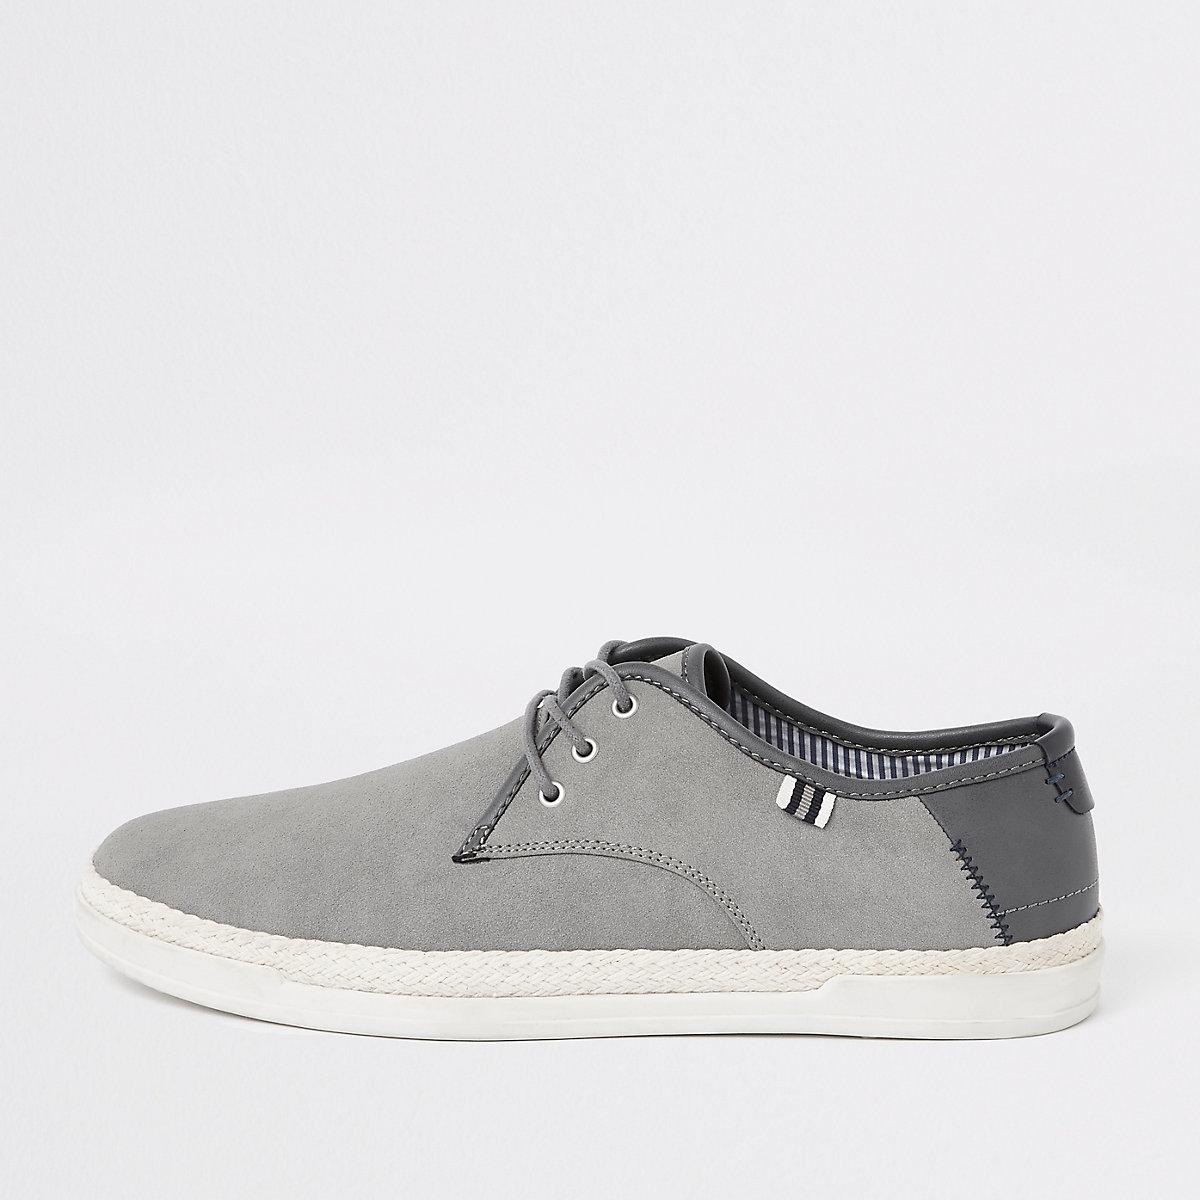 Grey espadrille trim lace-up plimsolls